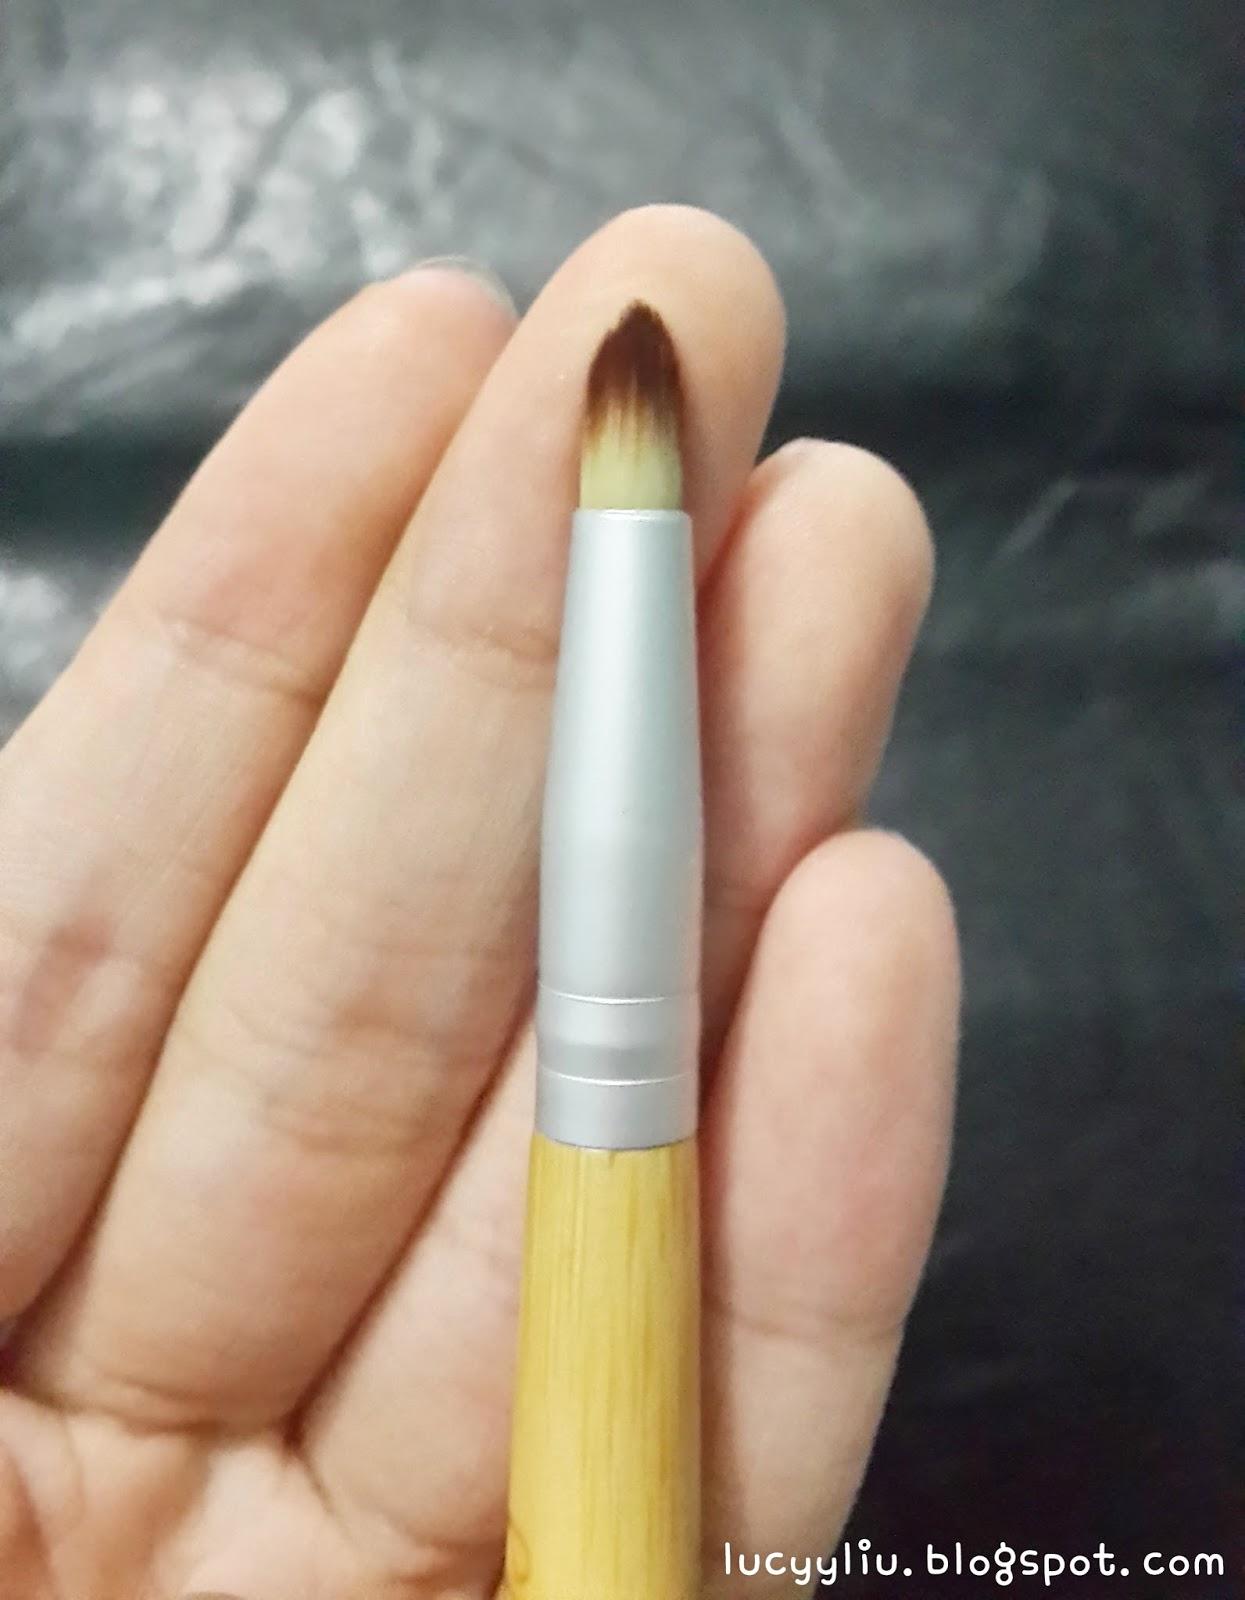 Ecotools Smudge Duo, Masami Shouko 311 and Sigma E25 eye brush